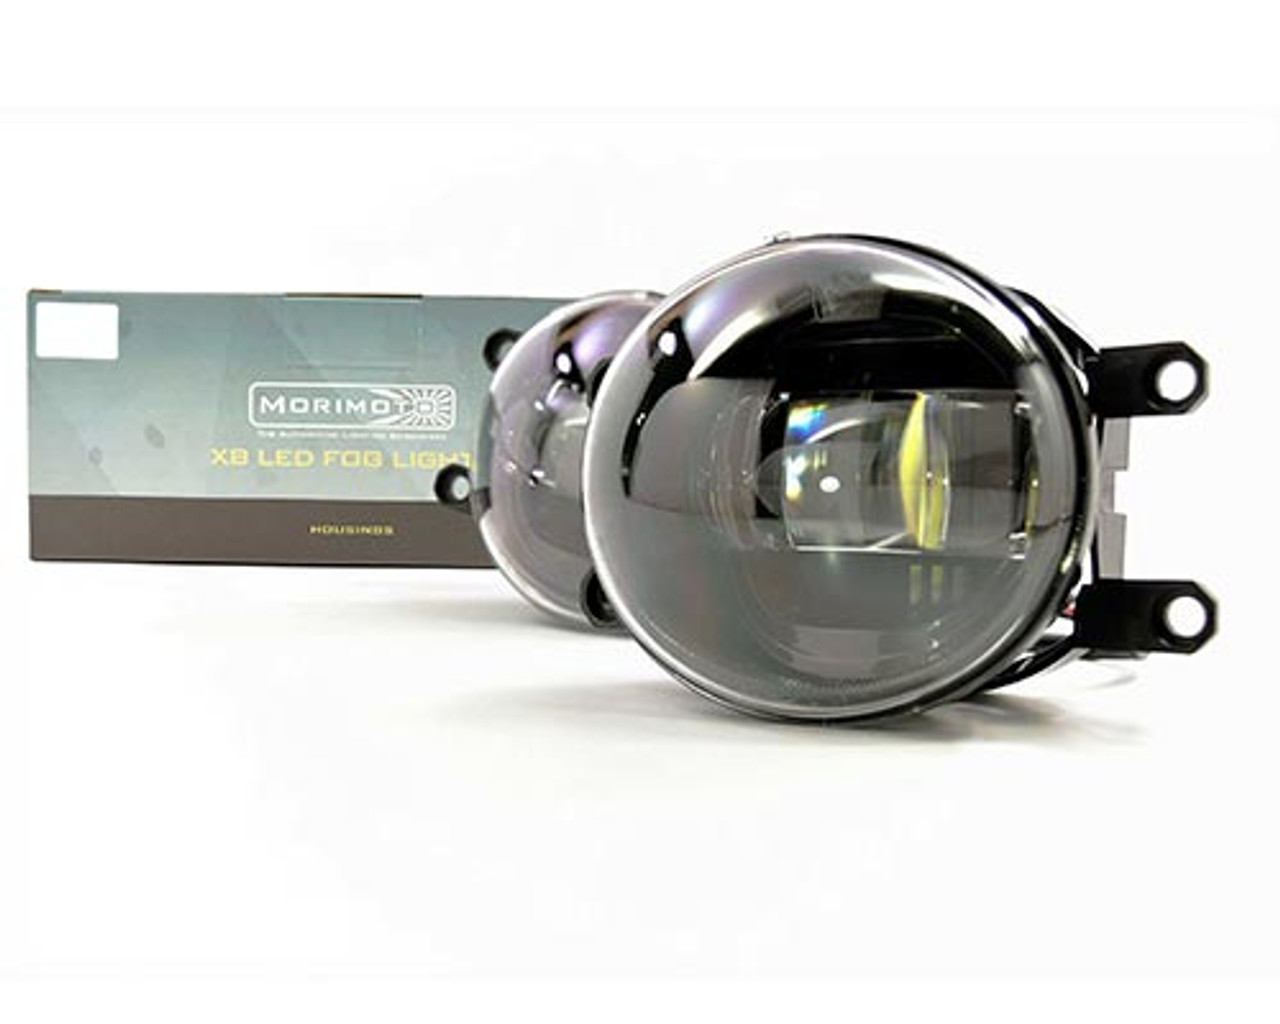 Toyota Morimoto XB LED Projector Fog Lights Oval style (LF220)